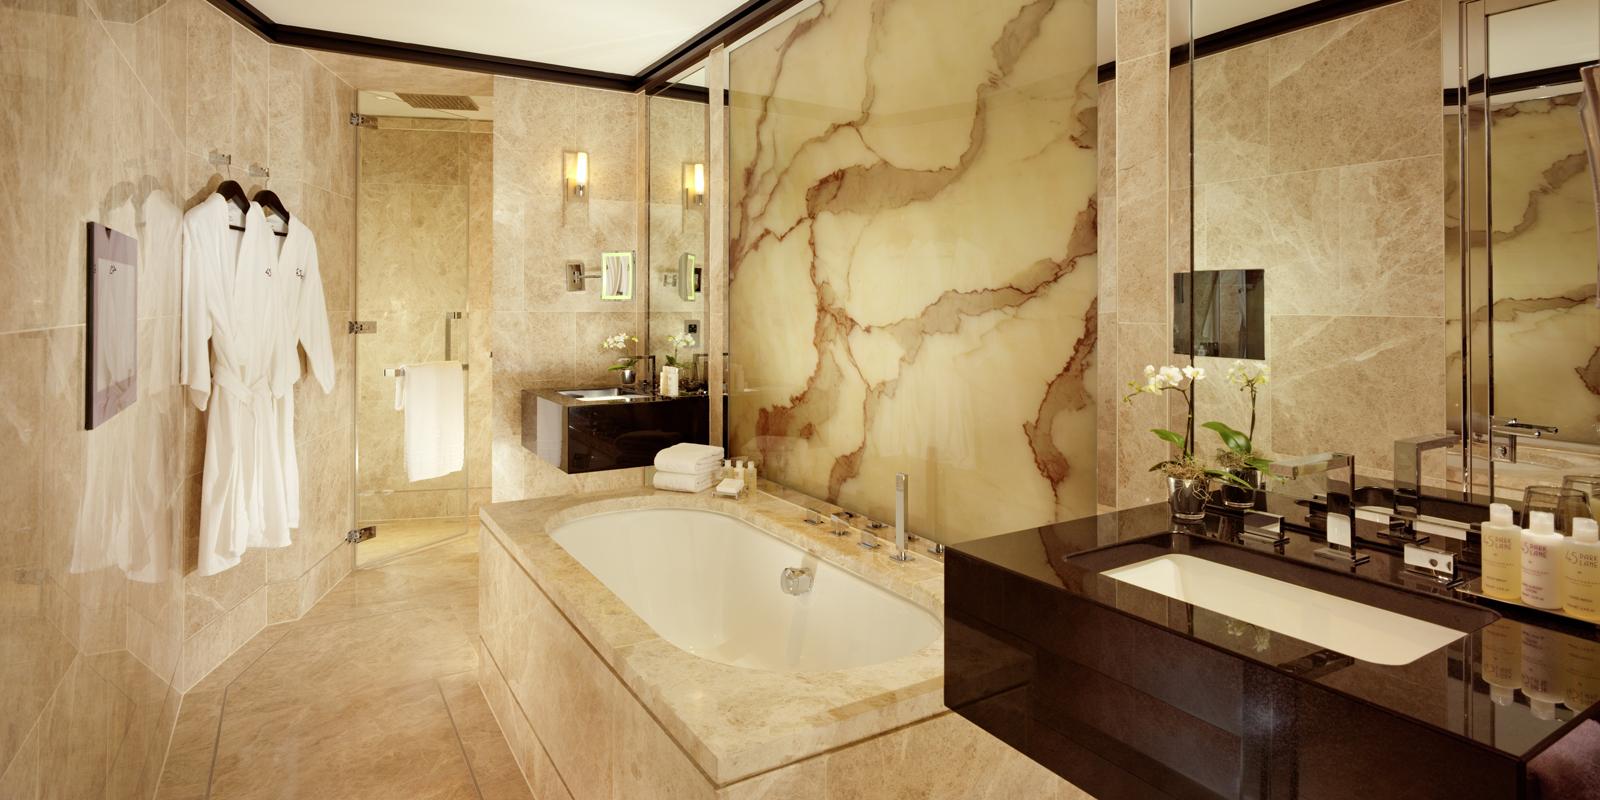 https://cdn.theculturetrip.com/wp-content/uploads/2016/03/45-park-lane-superior-room-bathroom.jpg